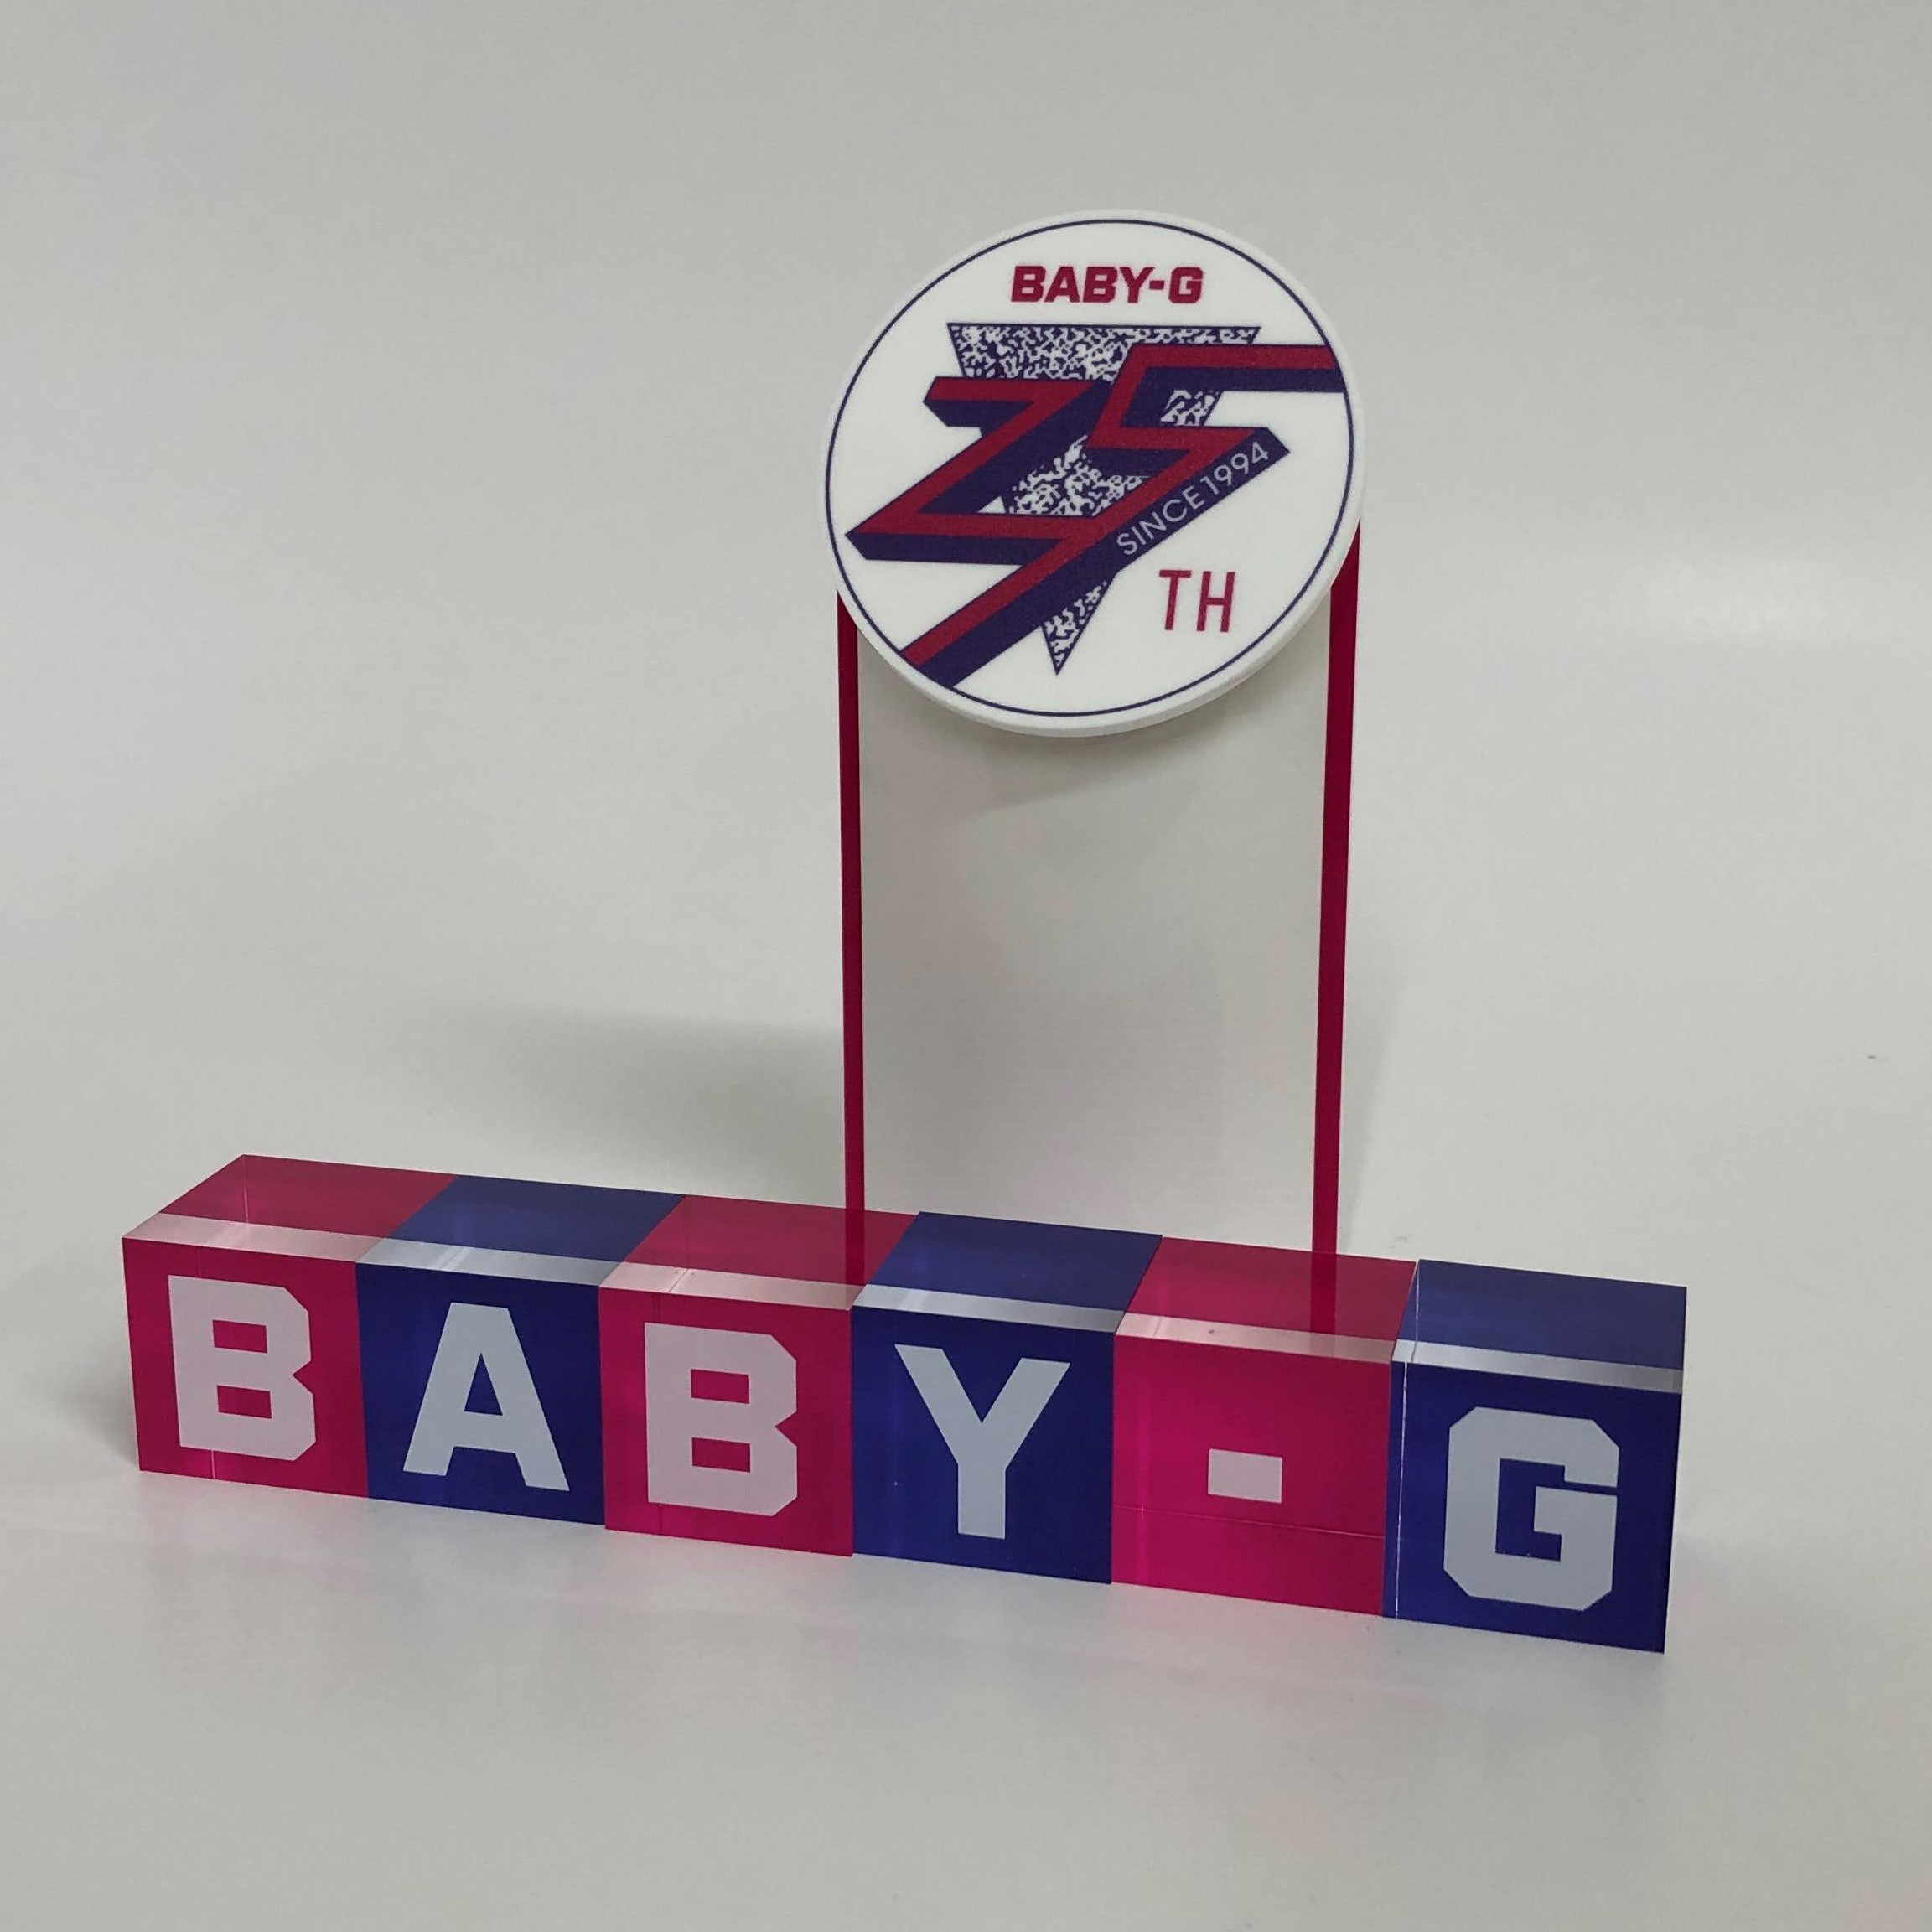 BABY-G 25thツール (1)